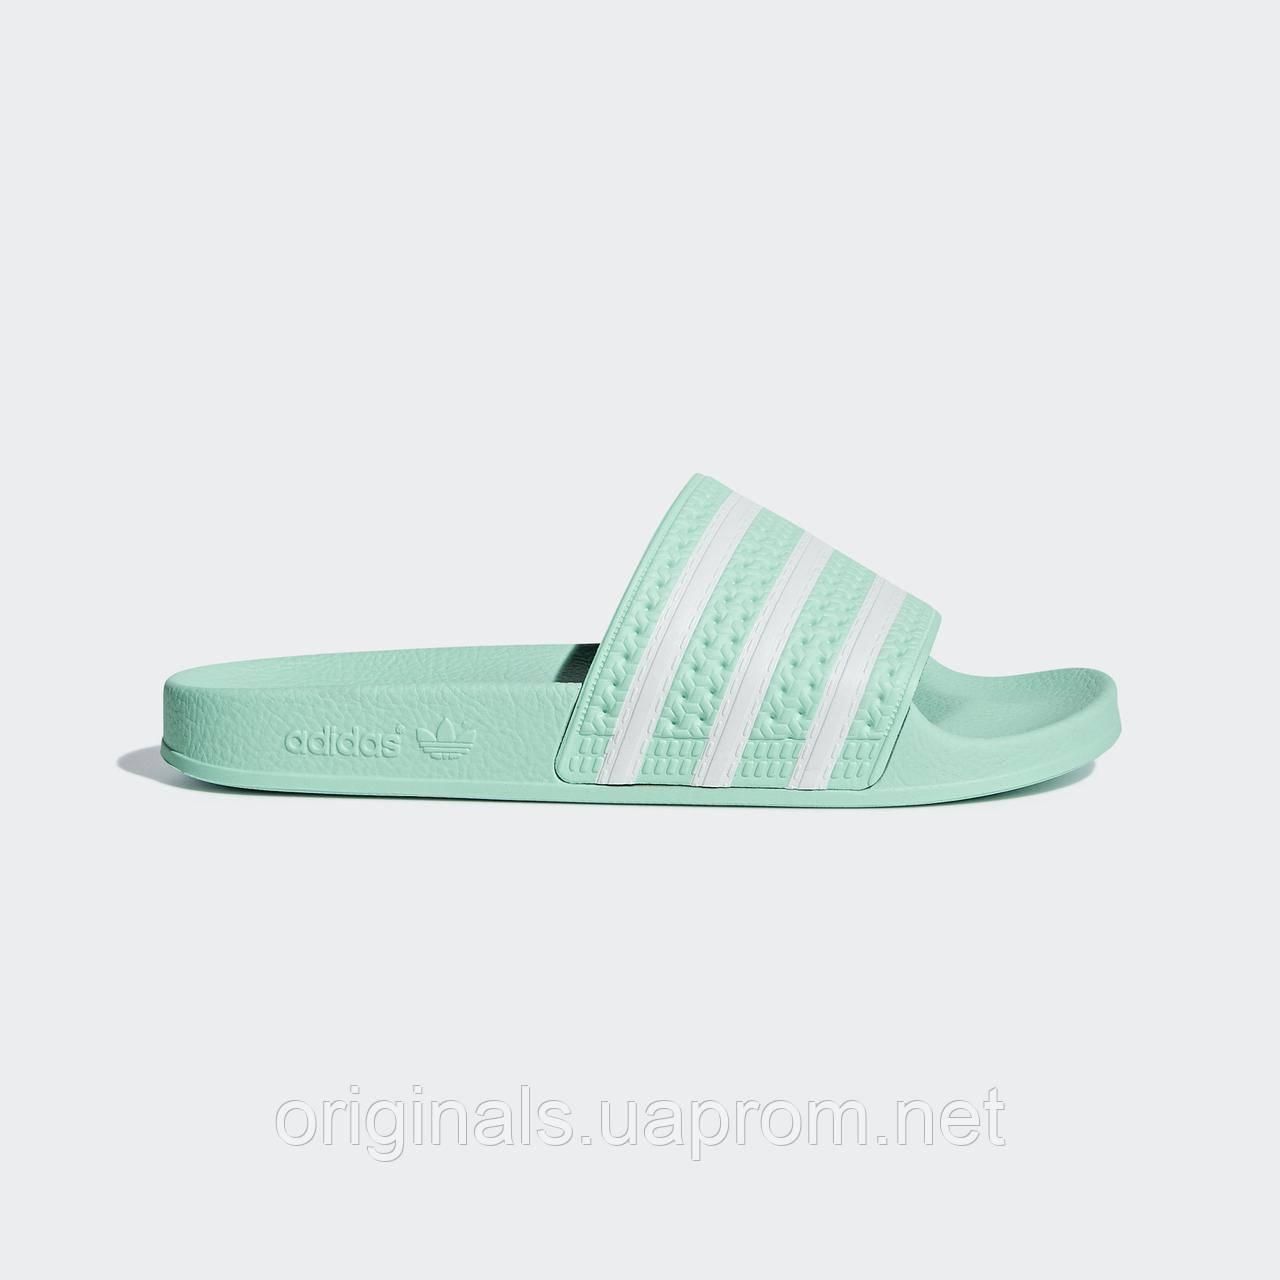 Тапочки Adidas Adilette W CG6538